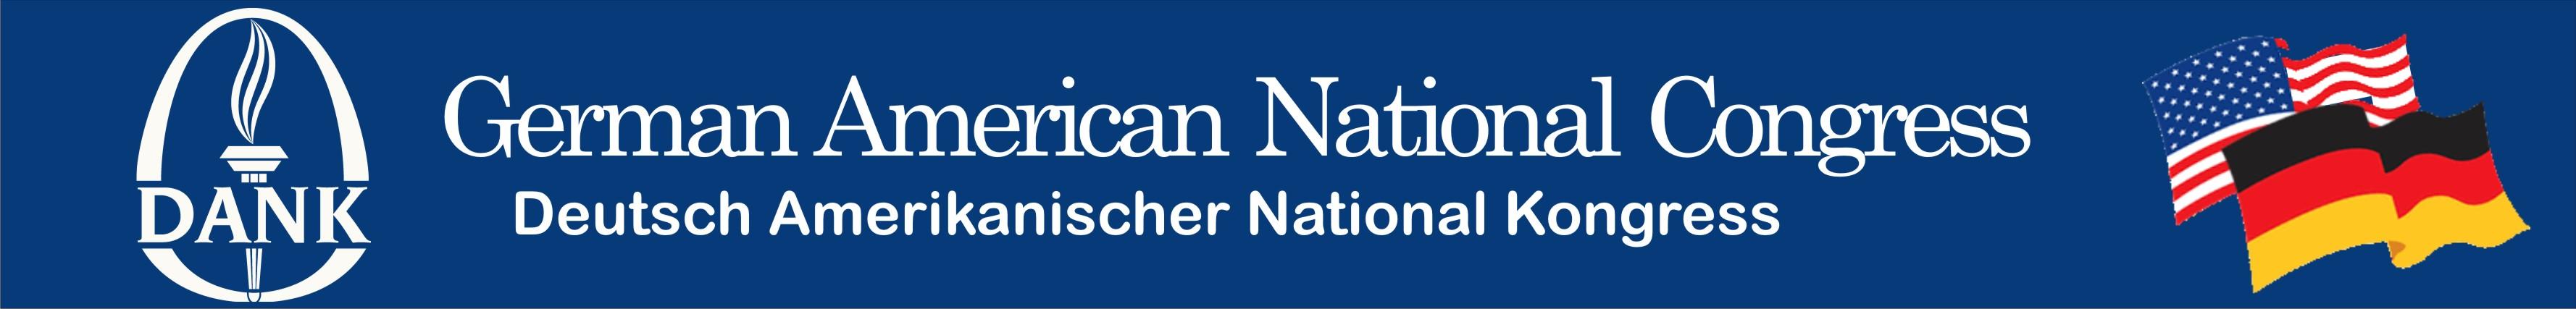 DANK National